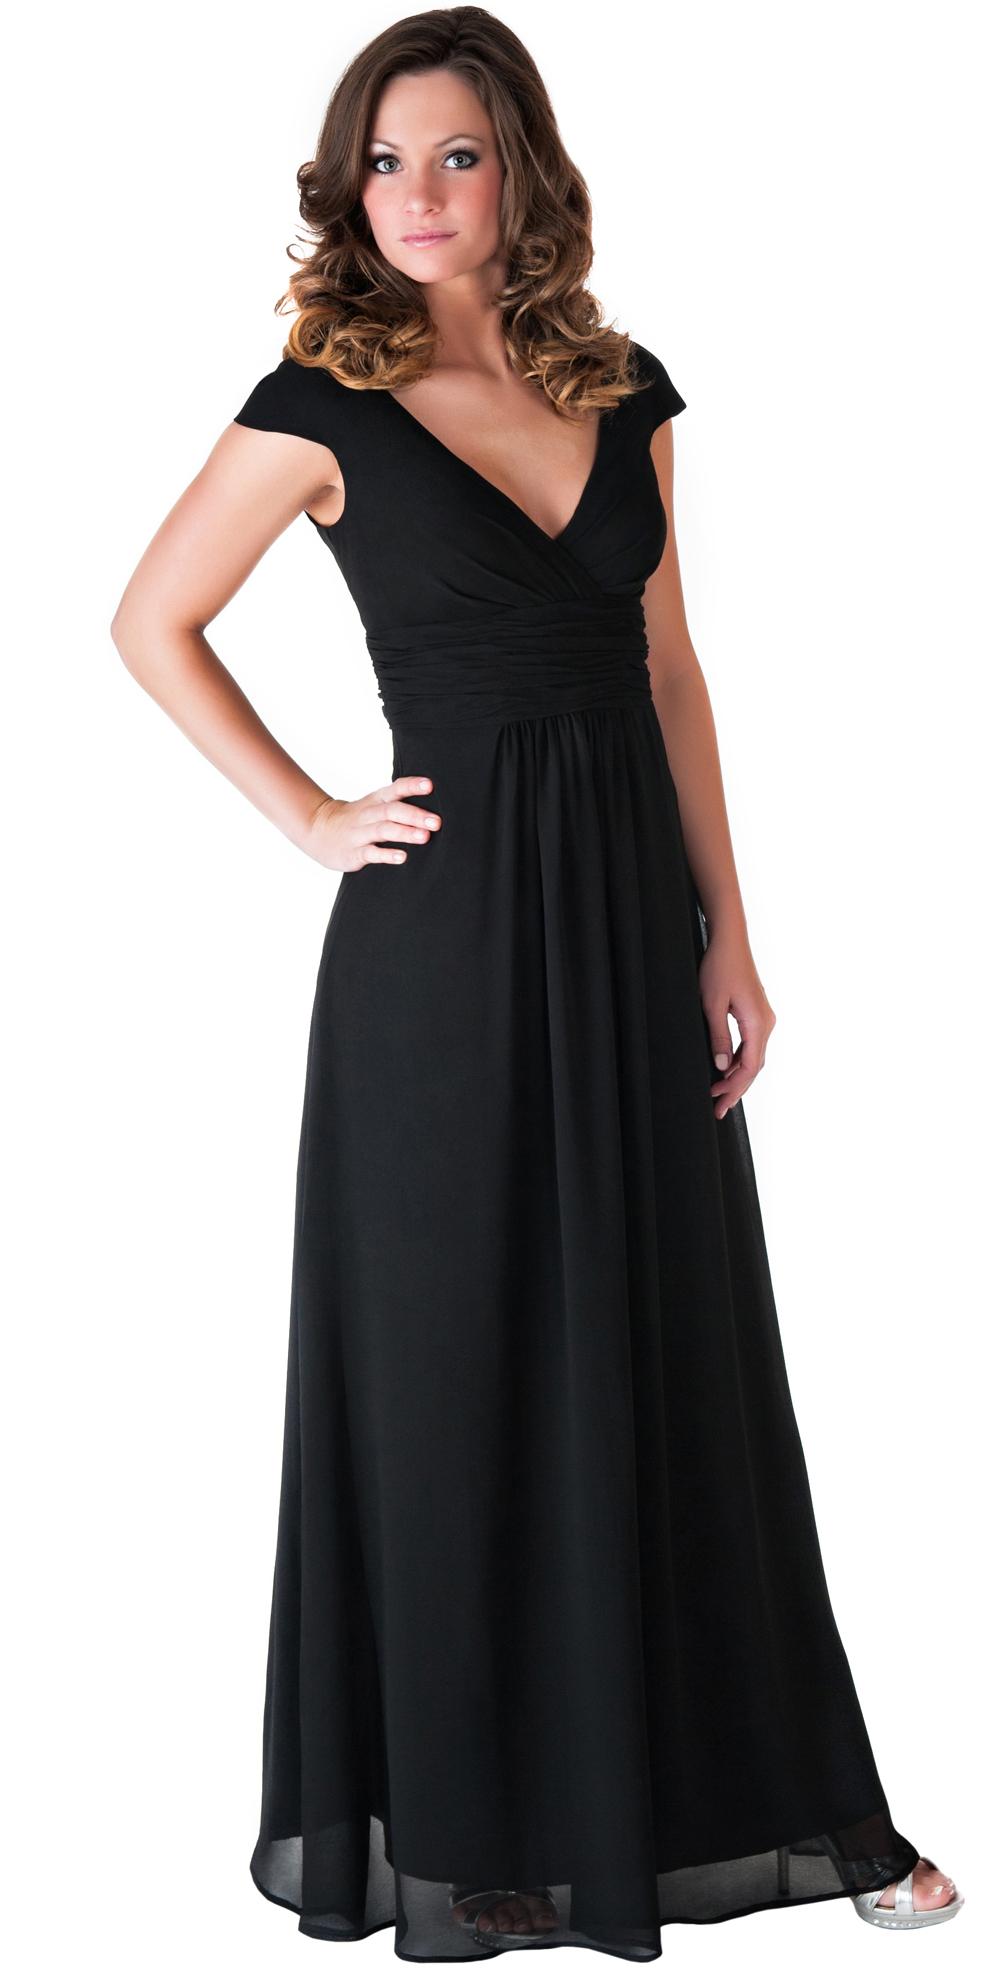 Formal Dress Elegant Women Long Evening Gown Bridesmaid Wedding Party Prom  eBay